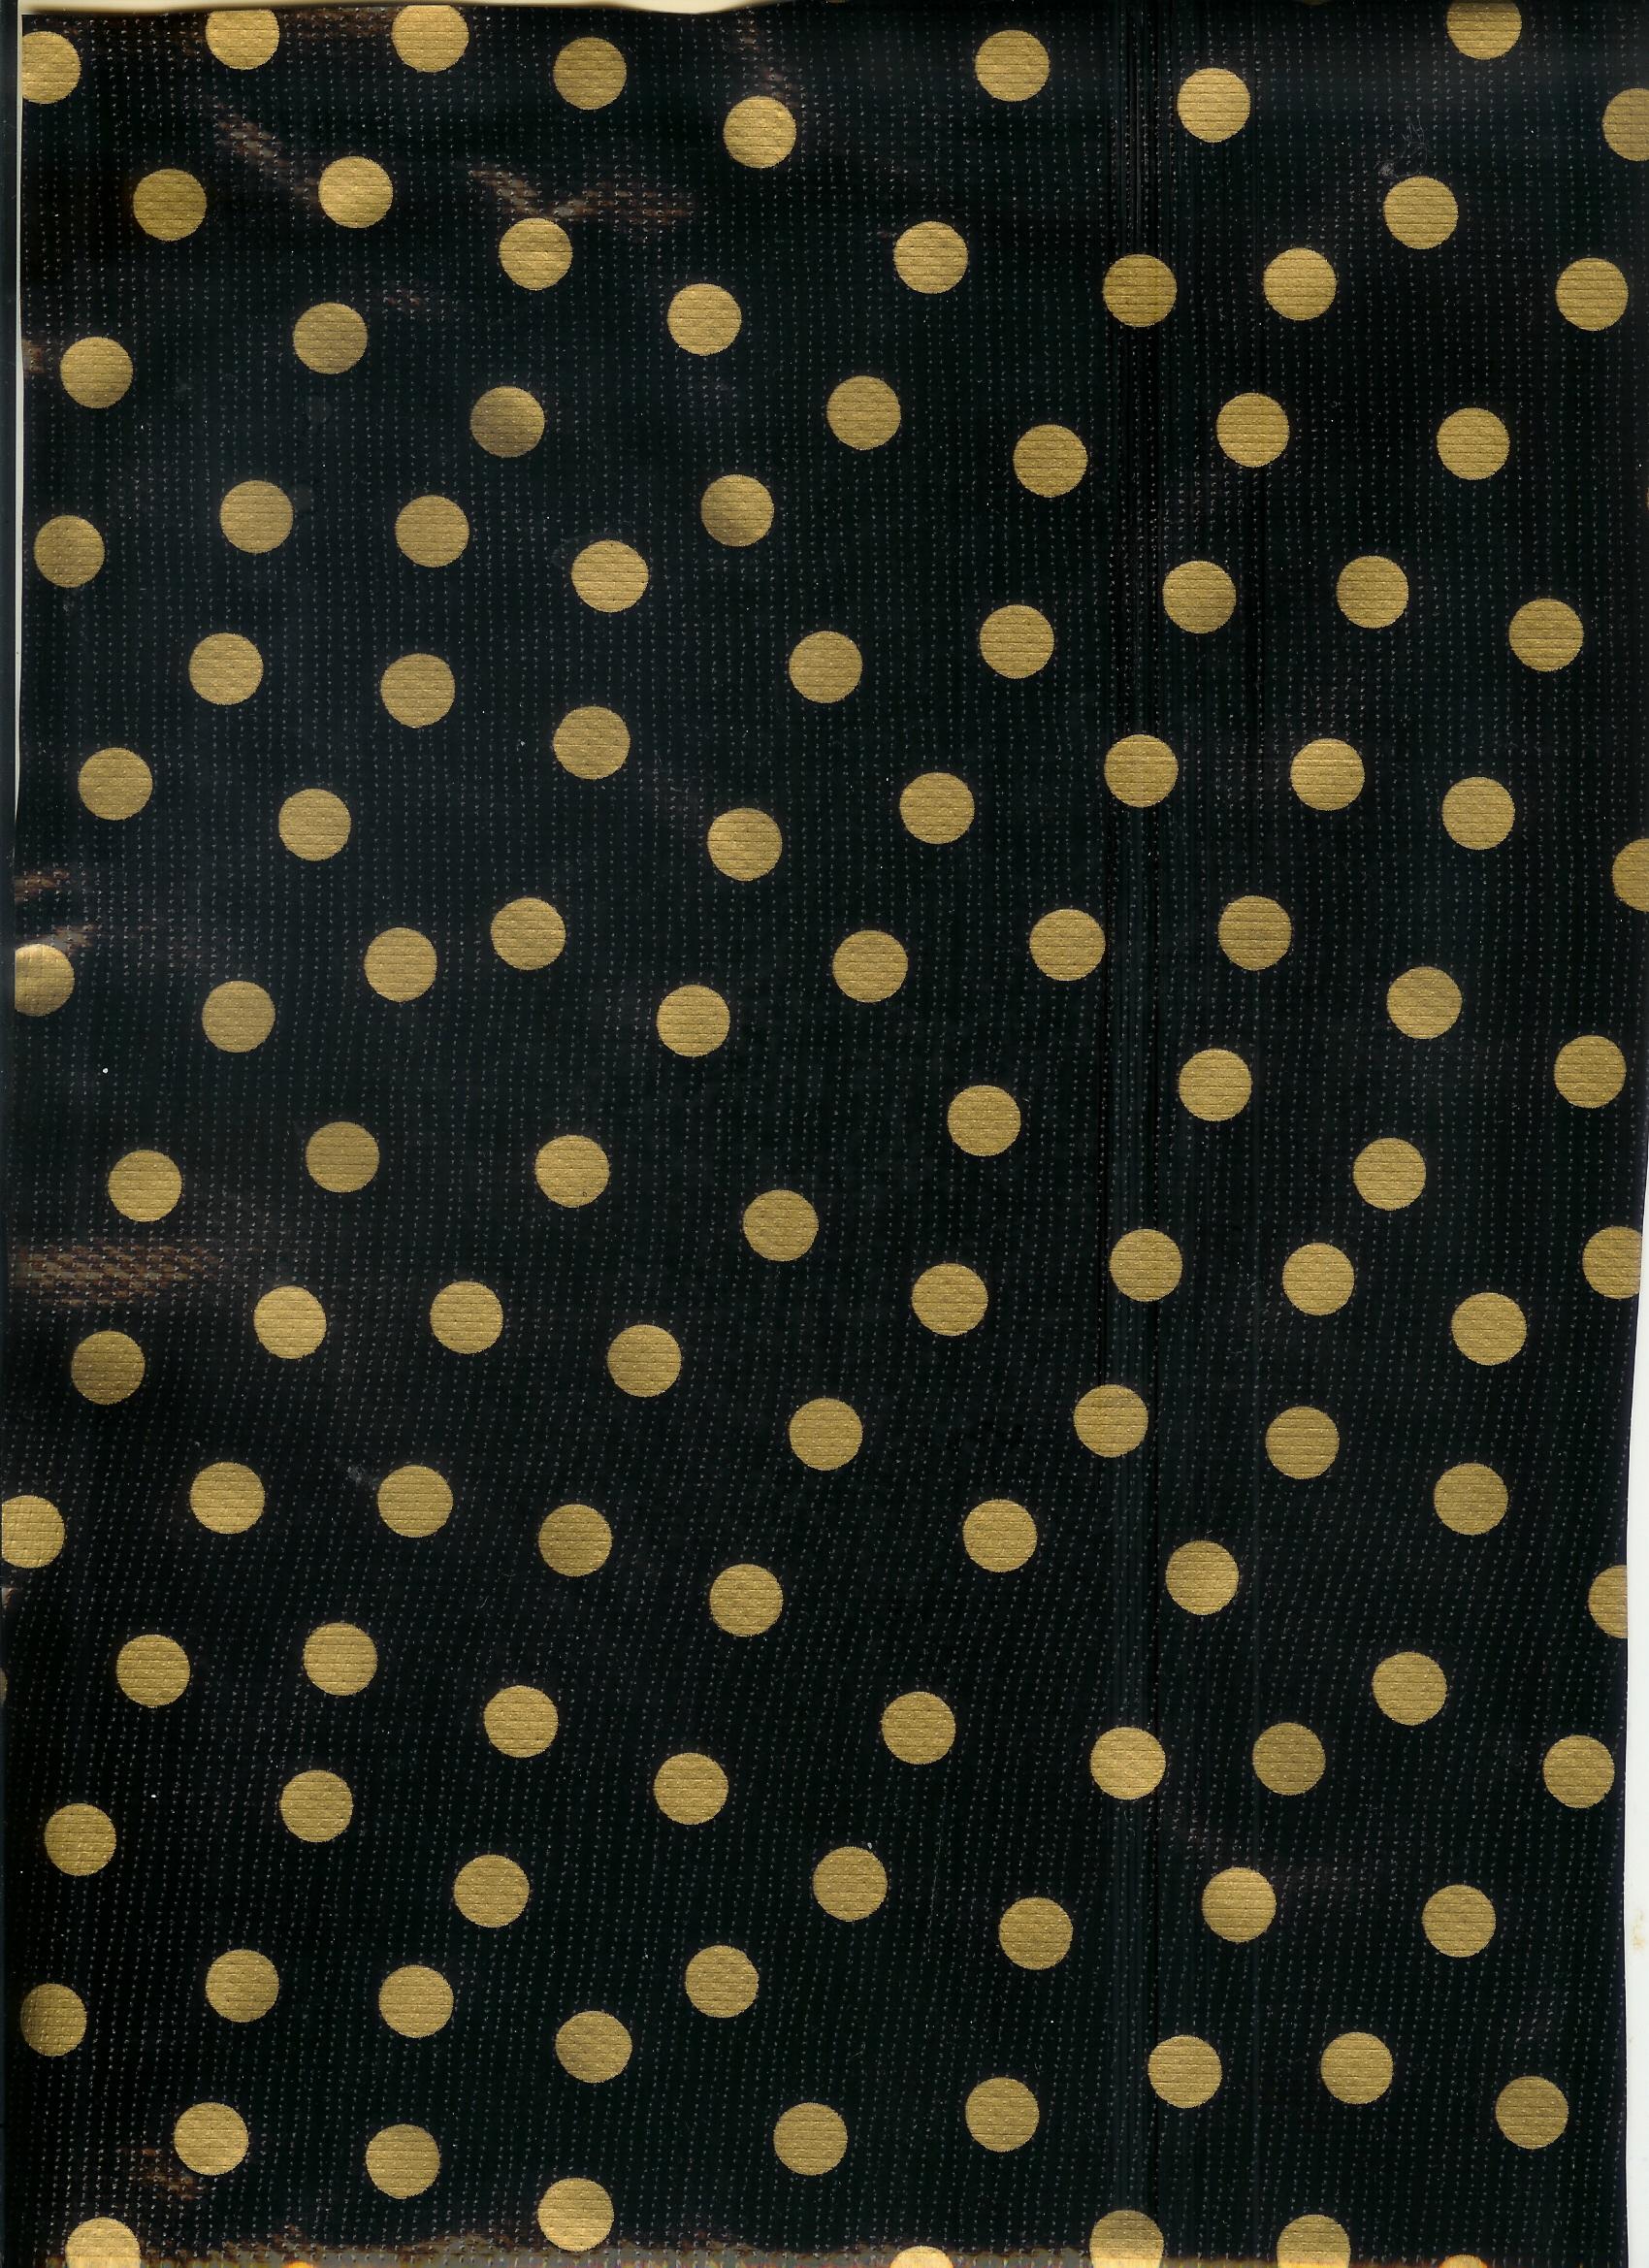 gold polka dot wallpaper gold polka dot 1700x2338